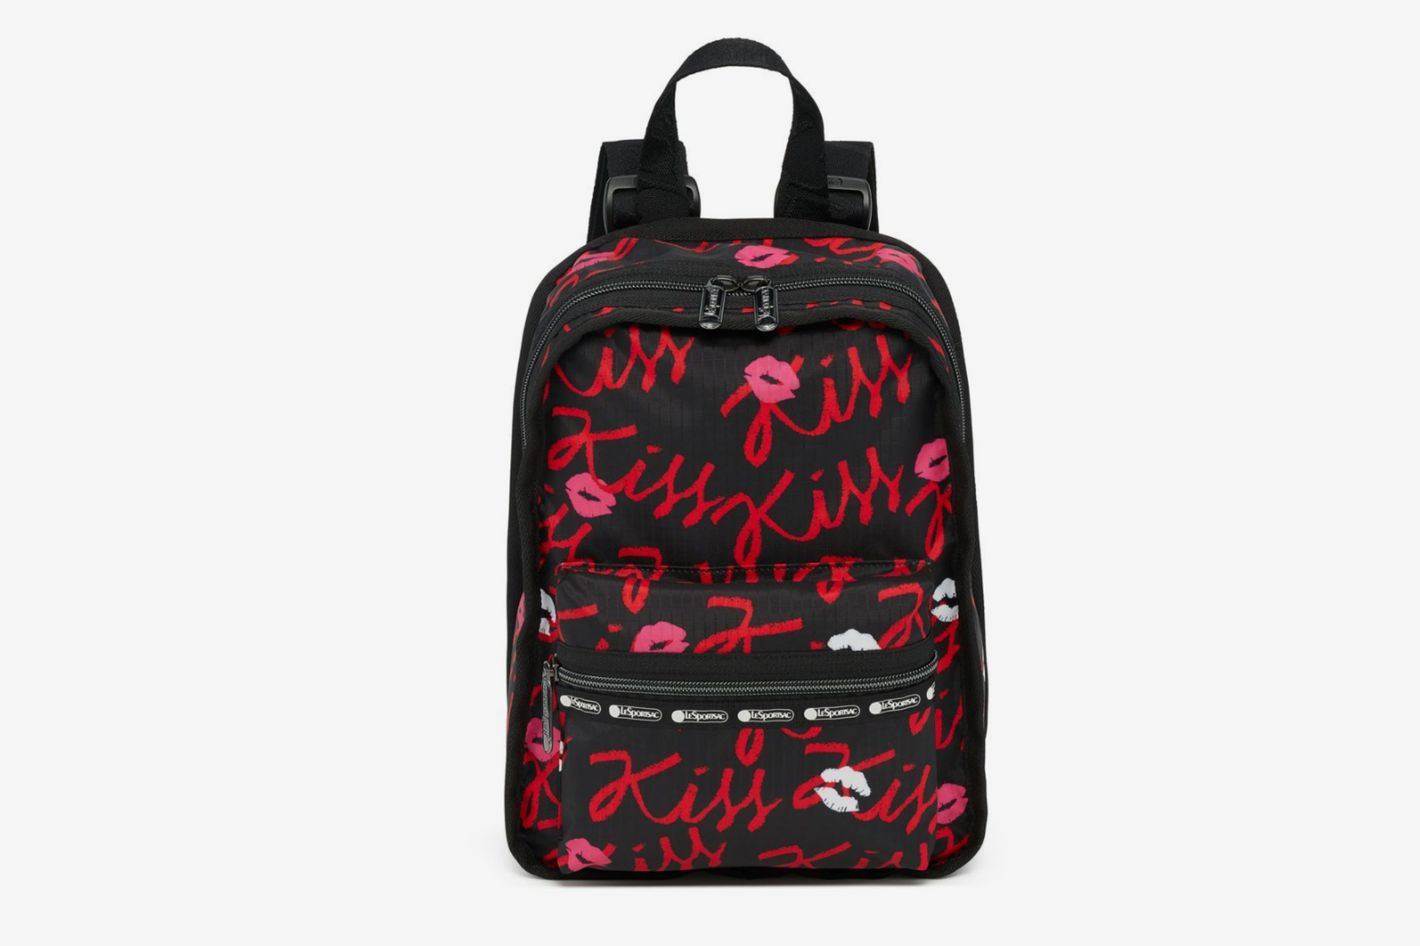 Alber Elbaz x Lesportsac Violet Backpack